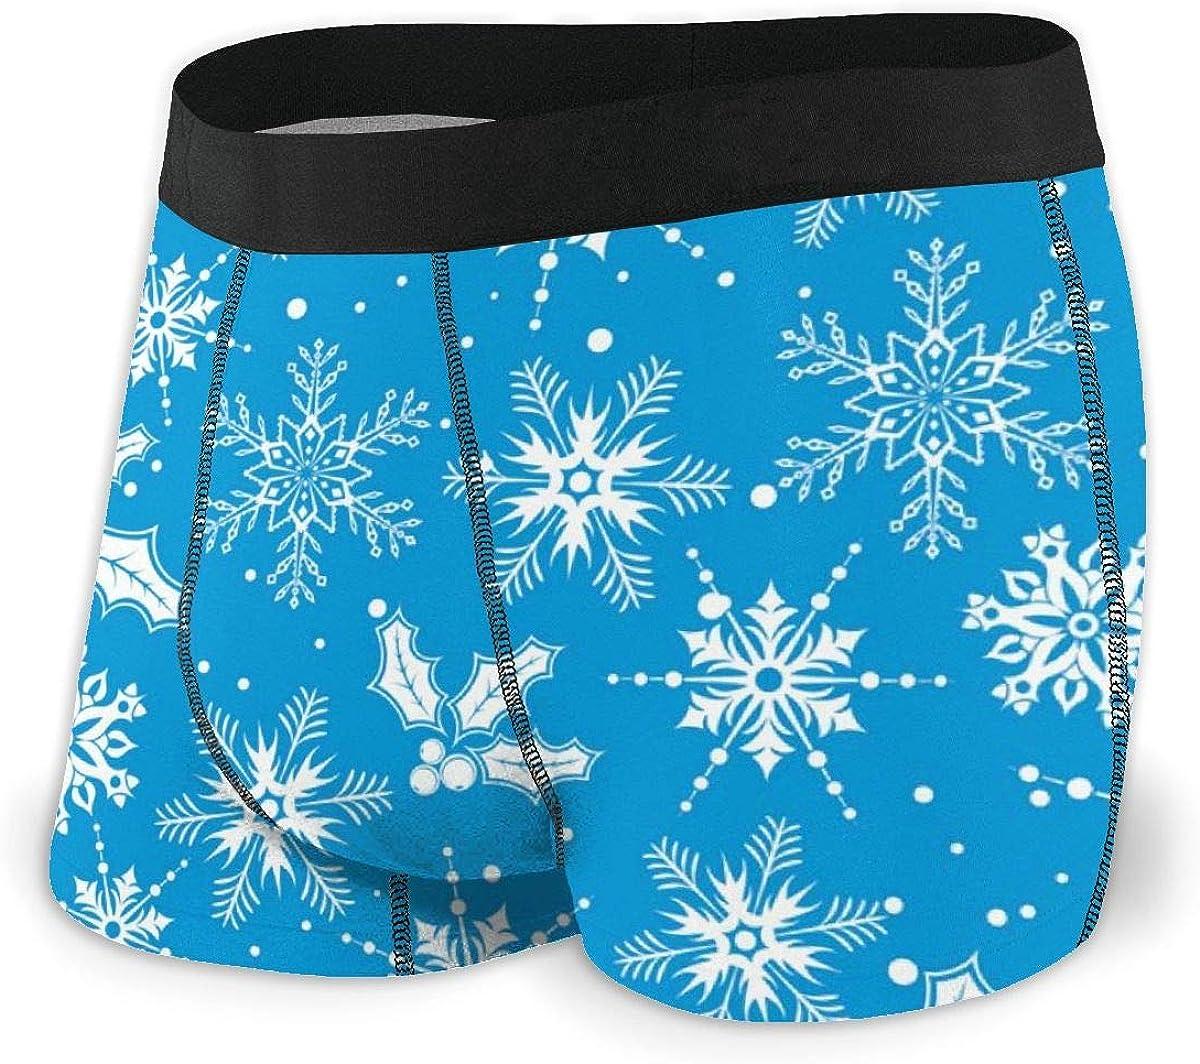 Mens Boxer Briefs Snowflake Winter Blue Breathable Underwear